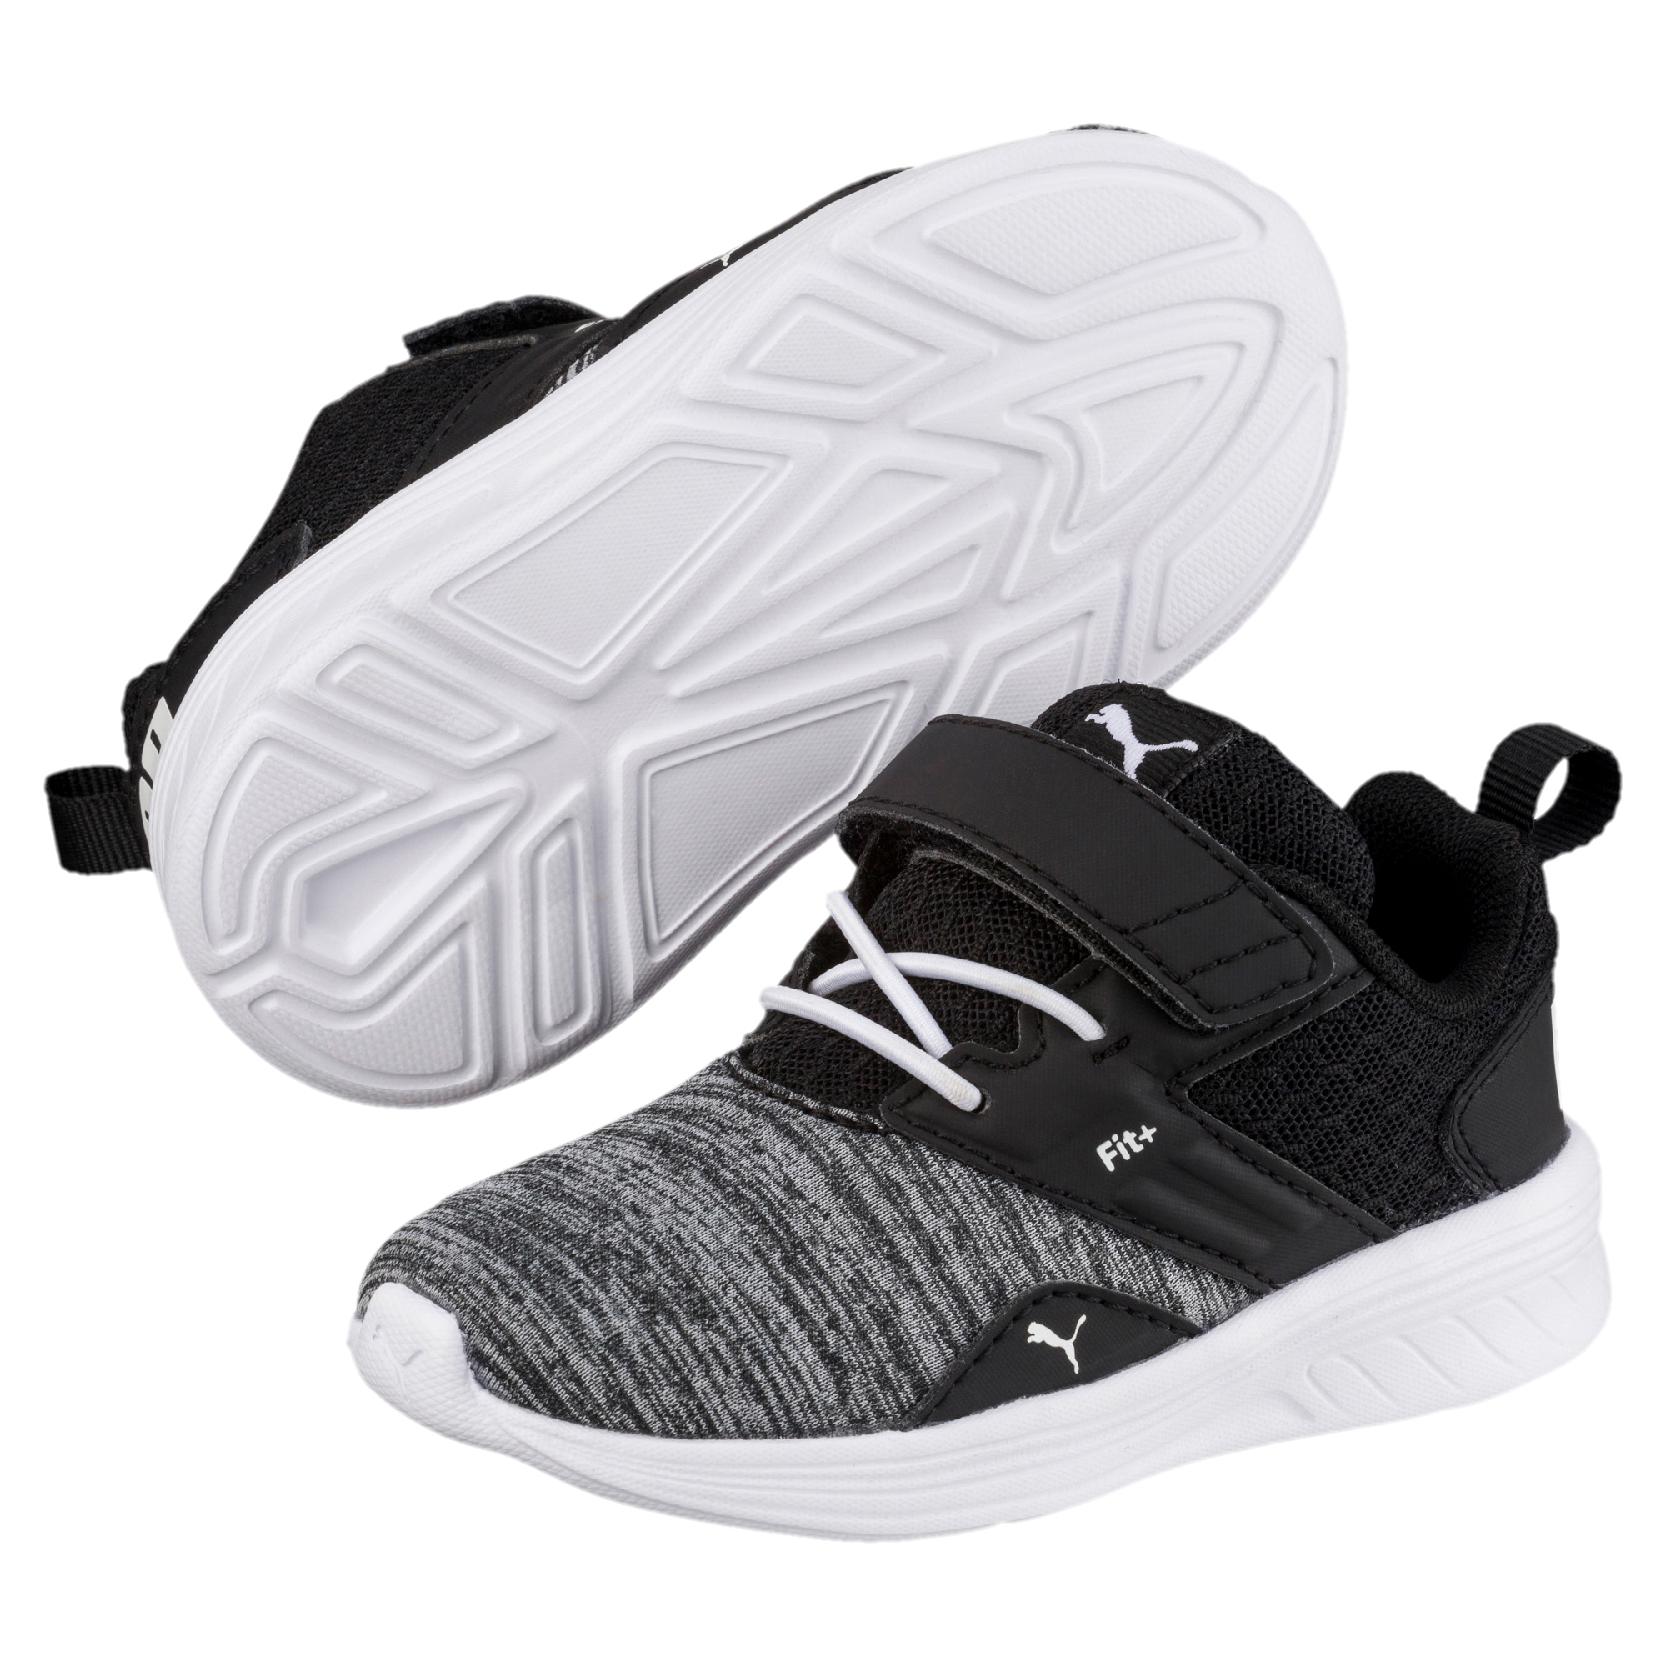 Puma Comet V Inf sneakers